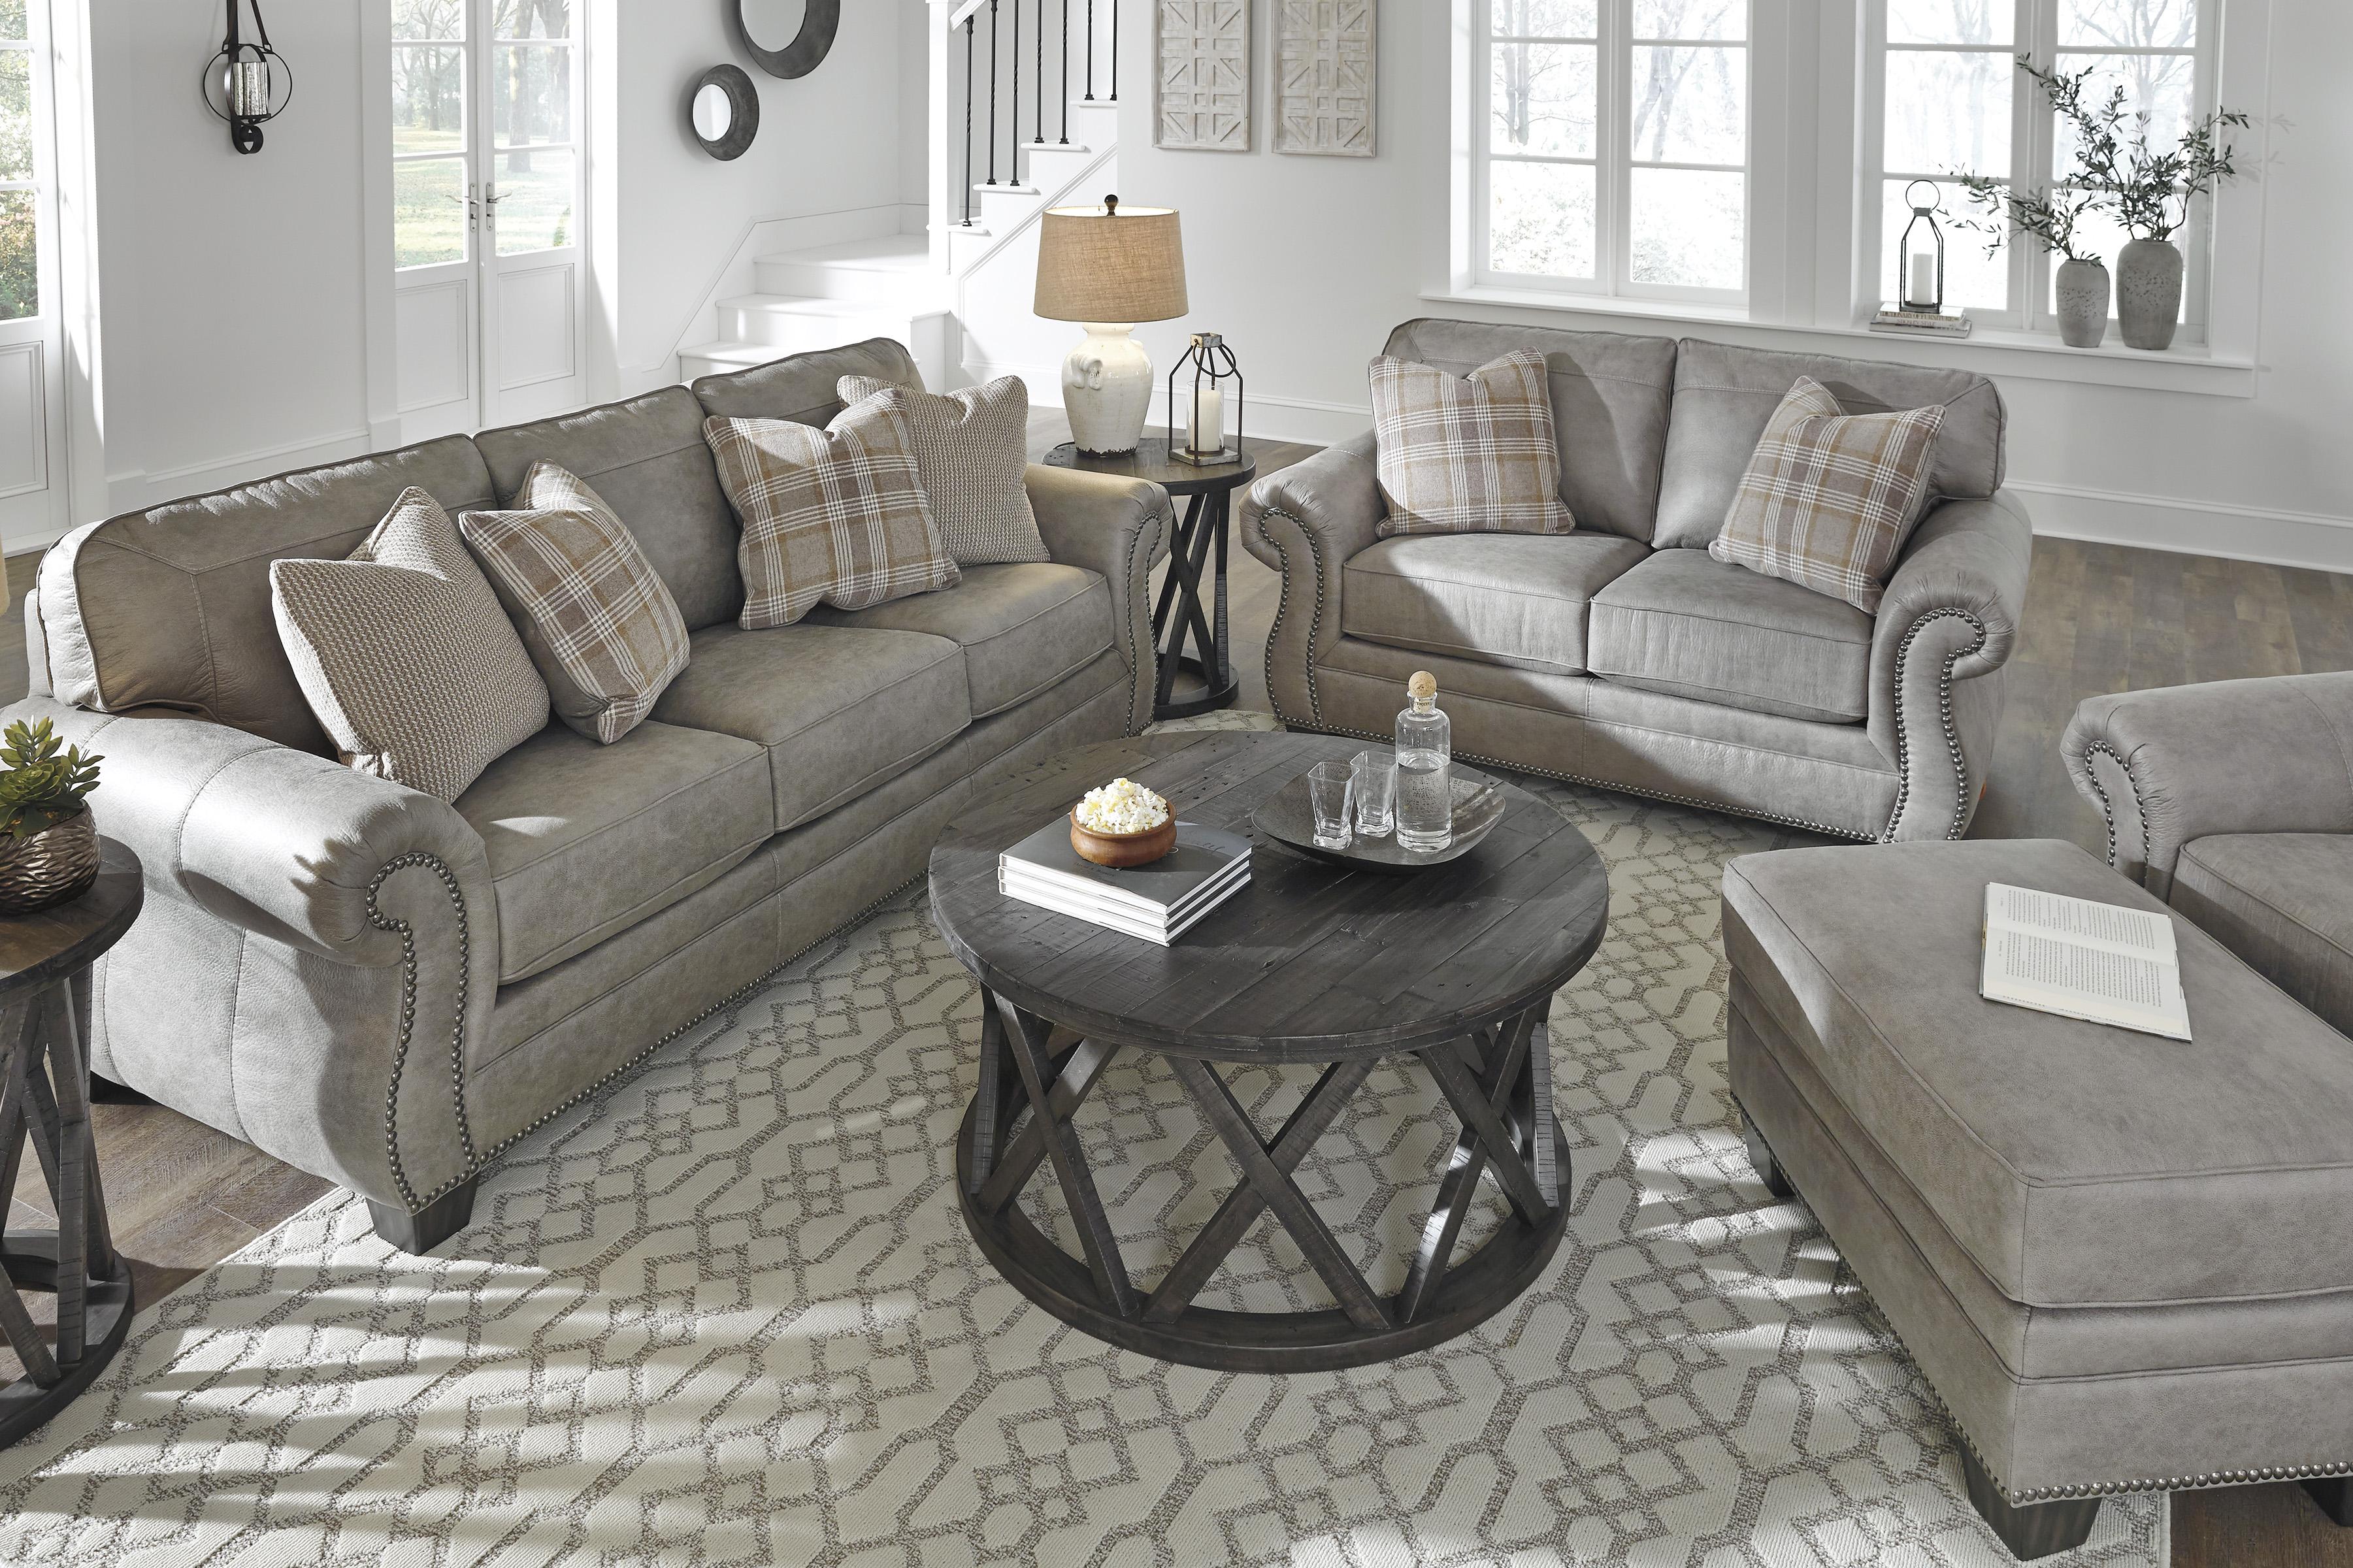 astounding american living room furniture   Living Room Sets – All American Mattress & Furniture